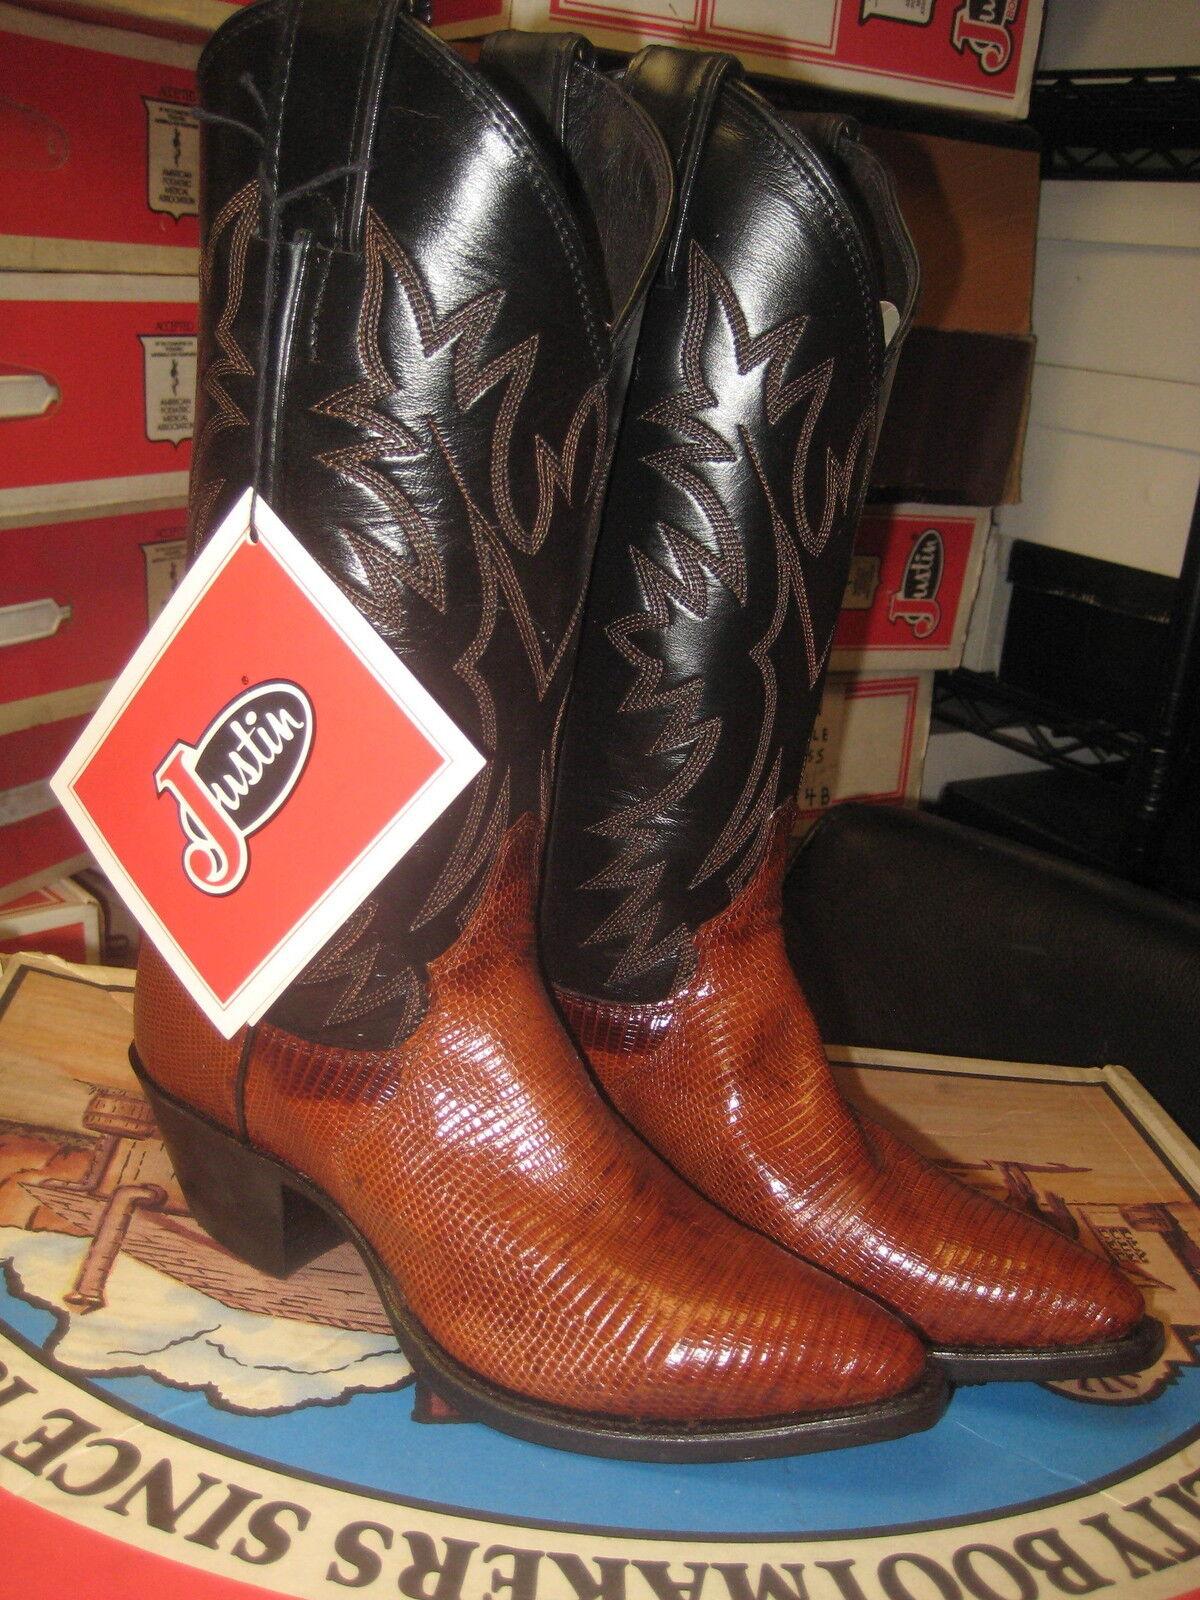 Justins womem's Brown Peanut Brittle Lizrard  Boot 4767  Size 5 B